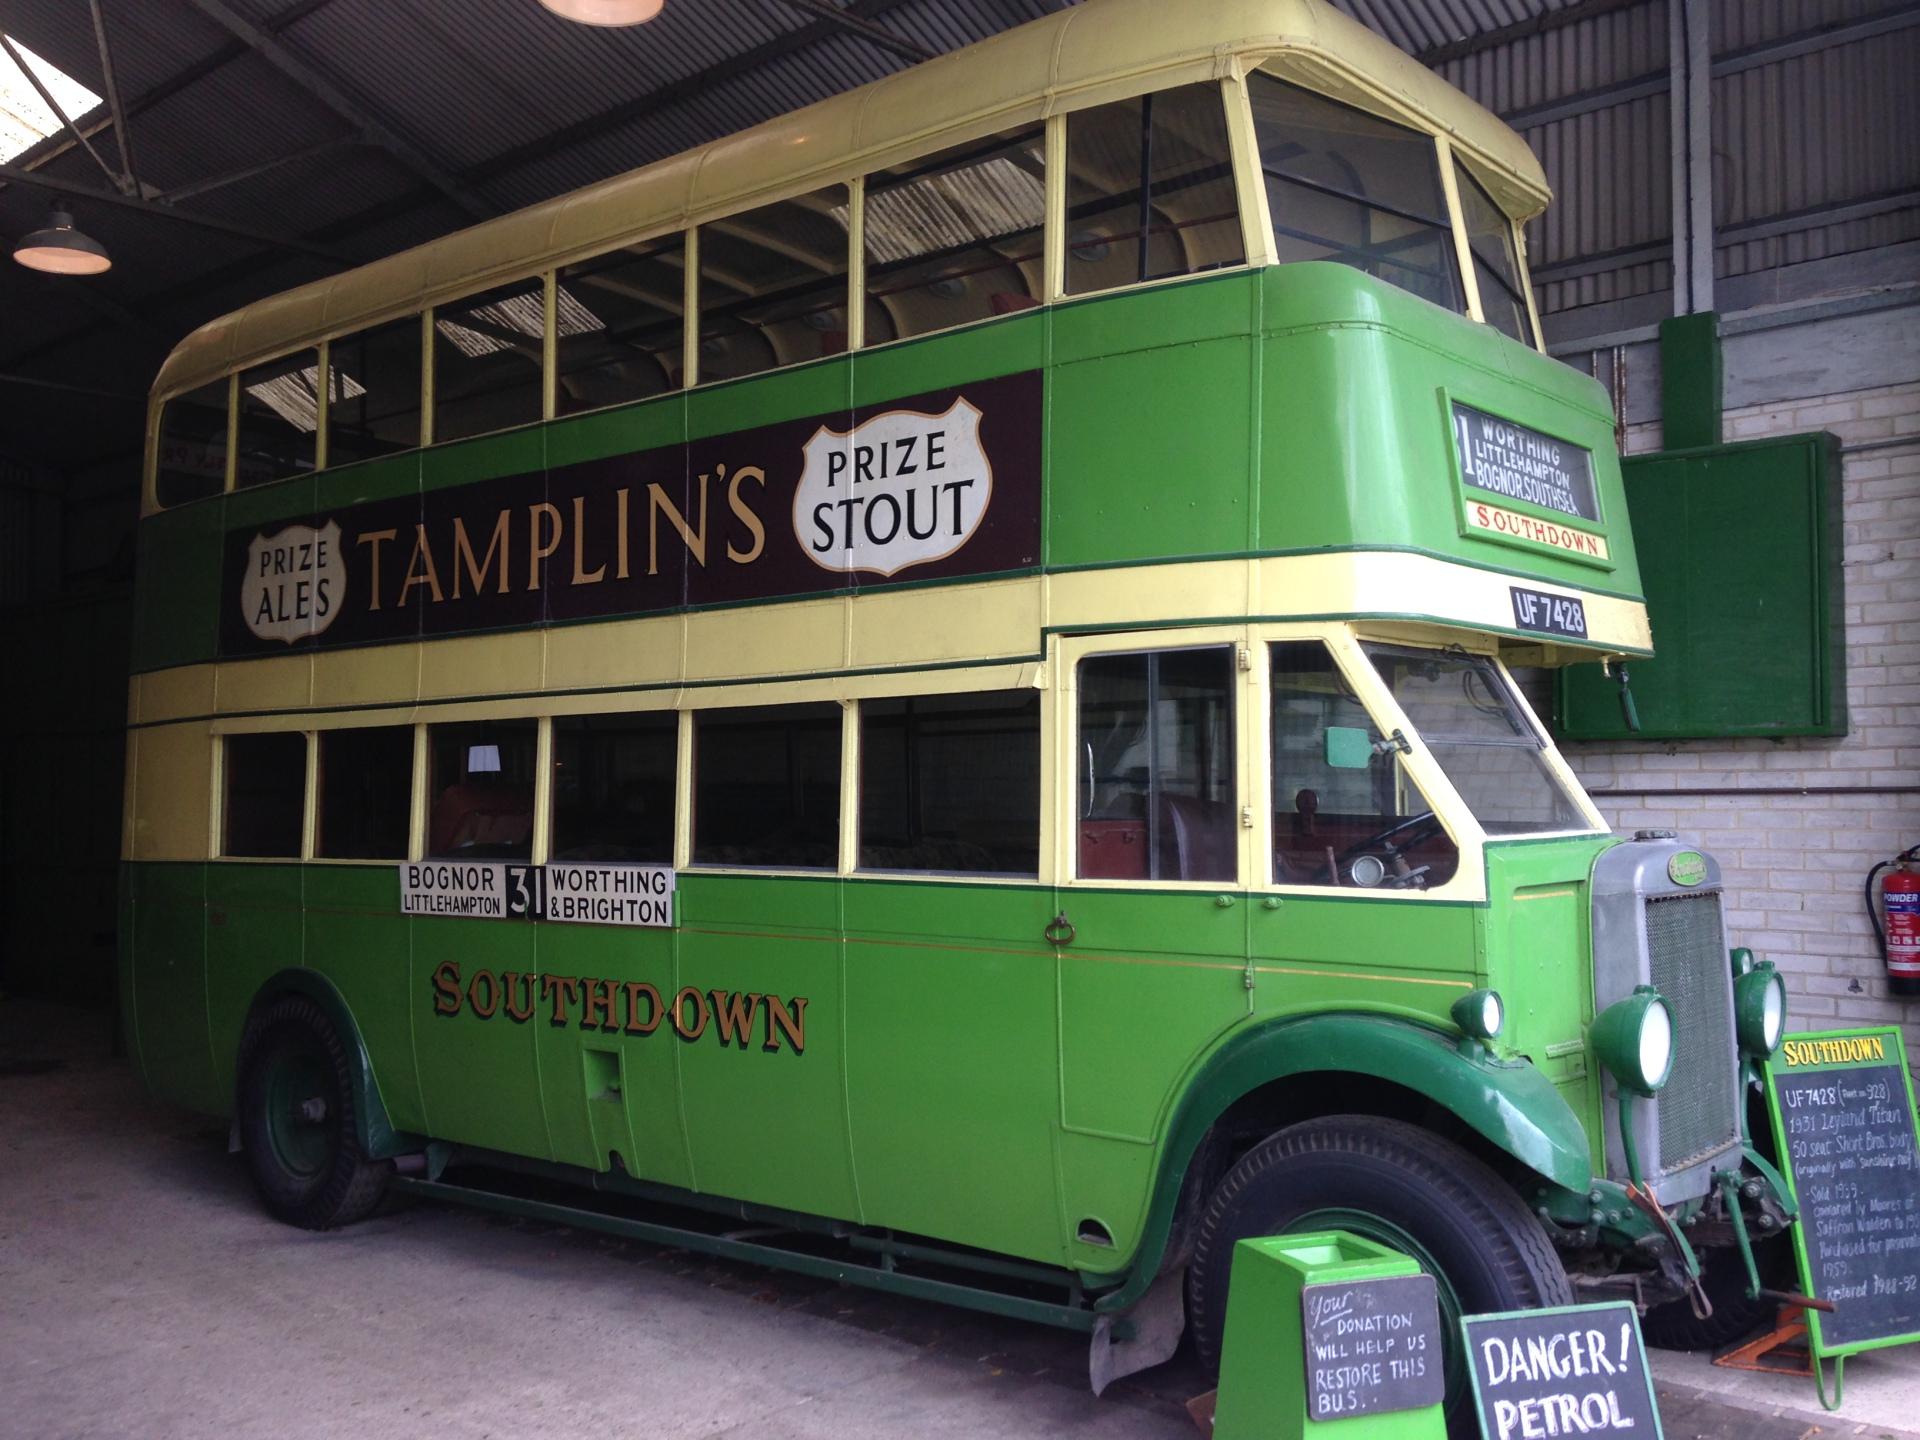 Southdown Bus Garage